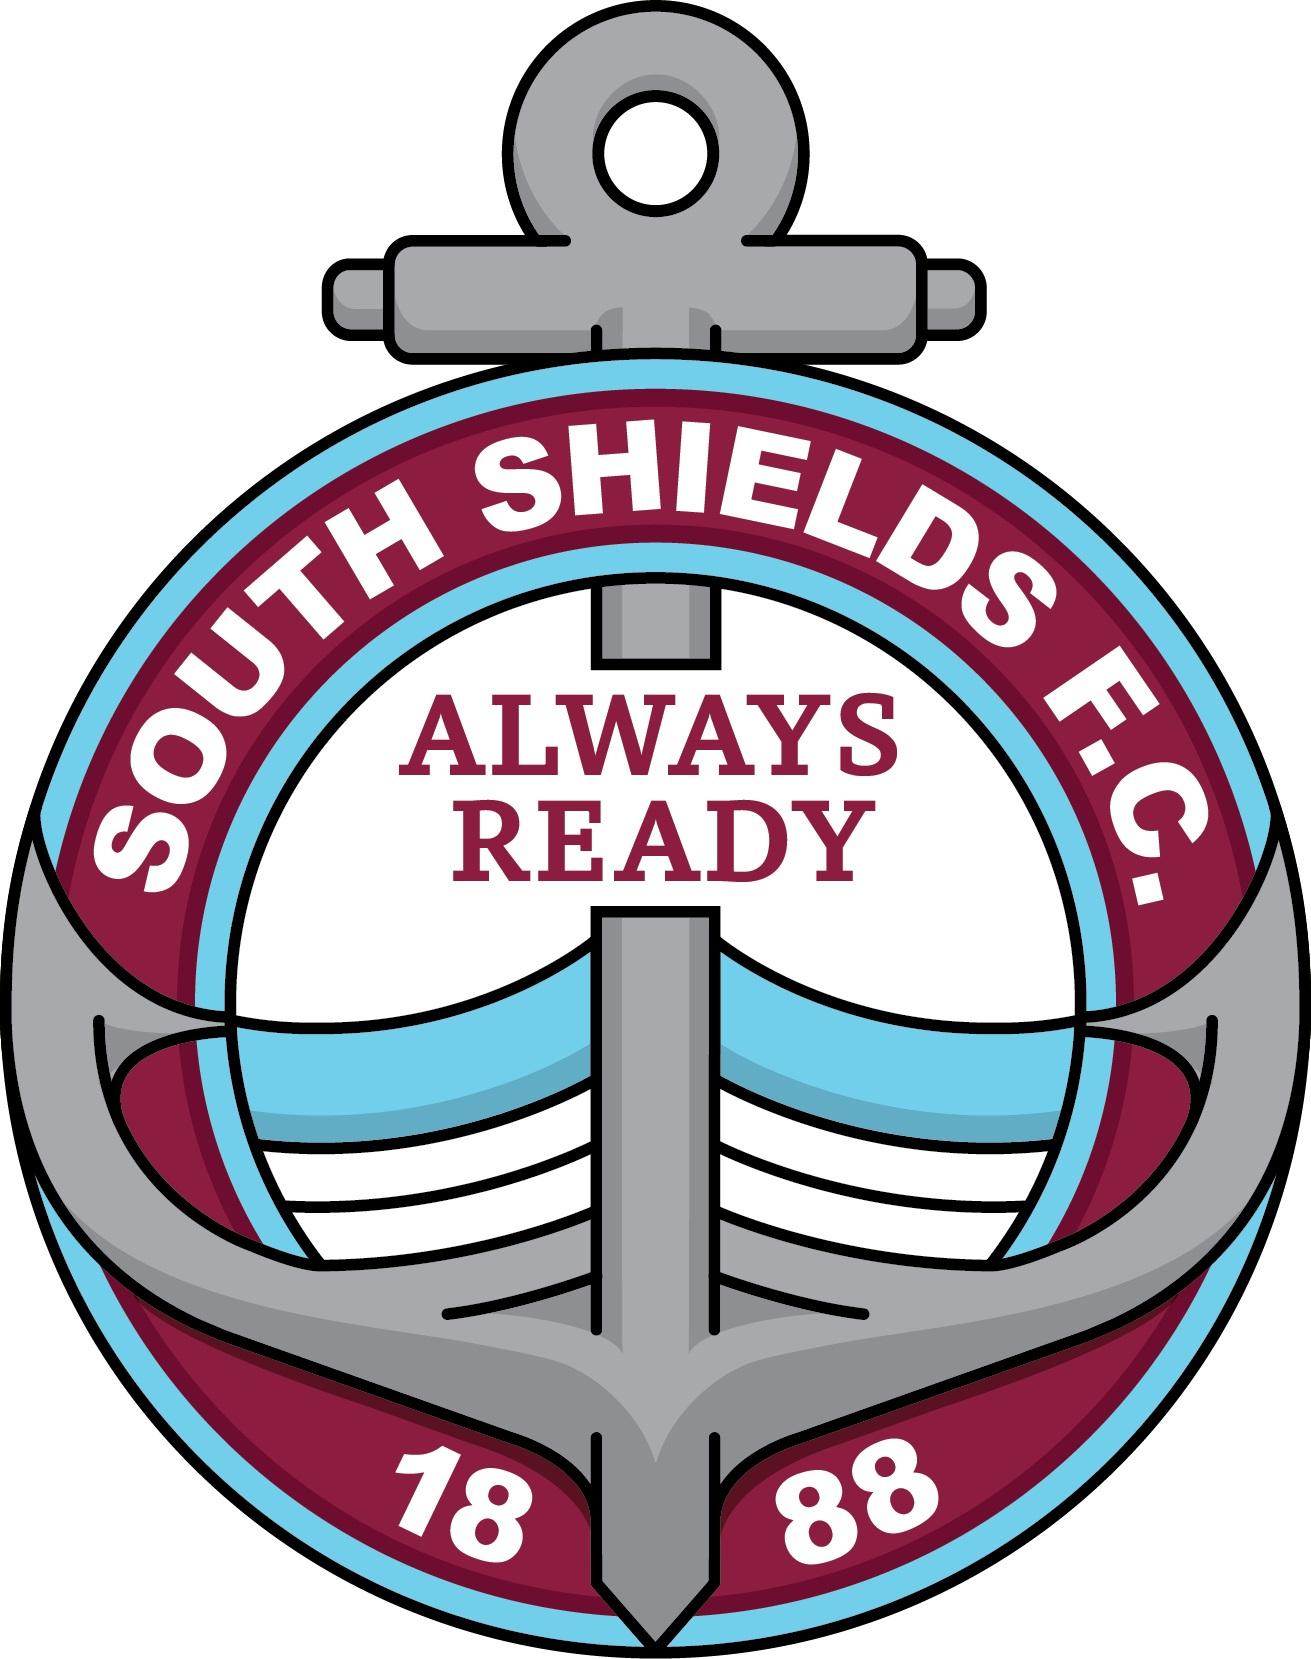 South Shields Logo